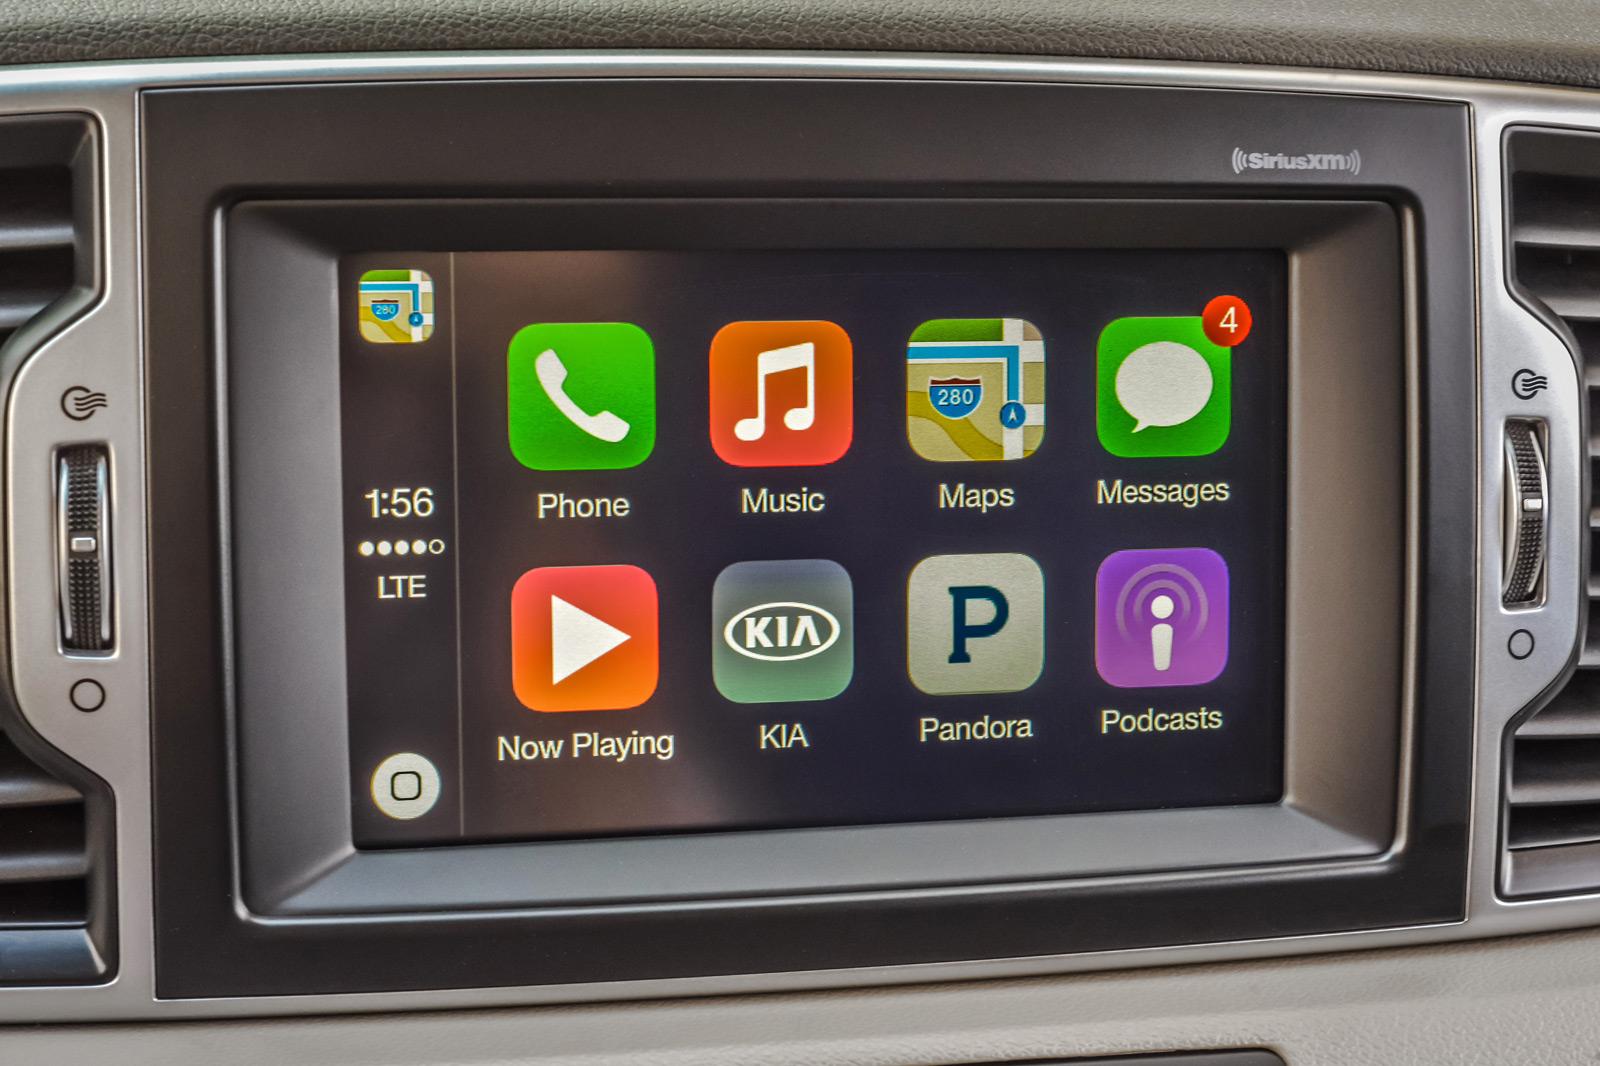 KIA 准备将 Android Auto 与 Apple CarPlay 支持下放旧款车型